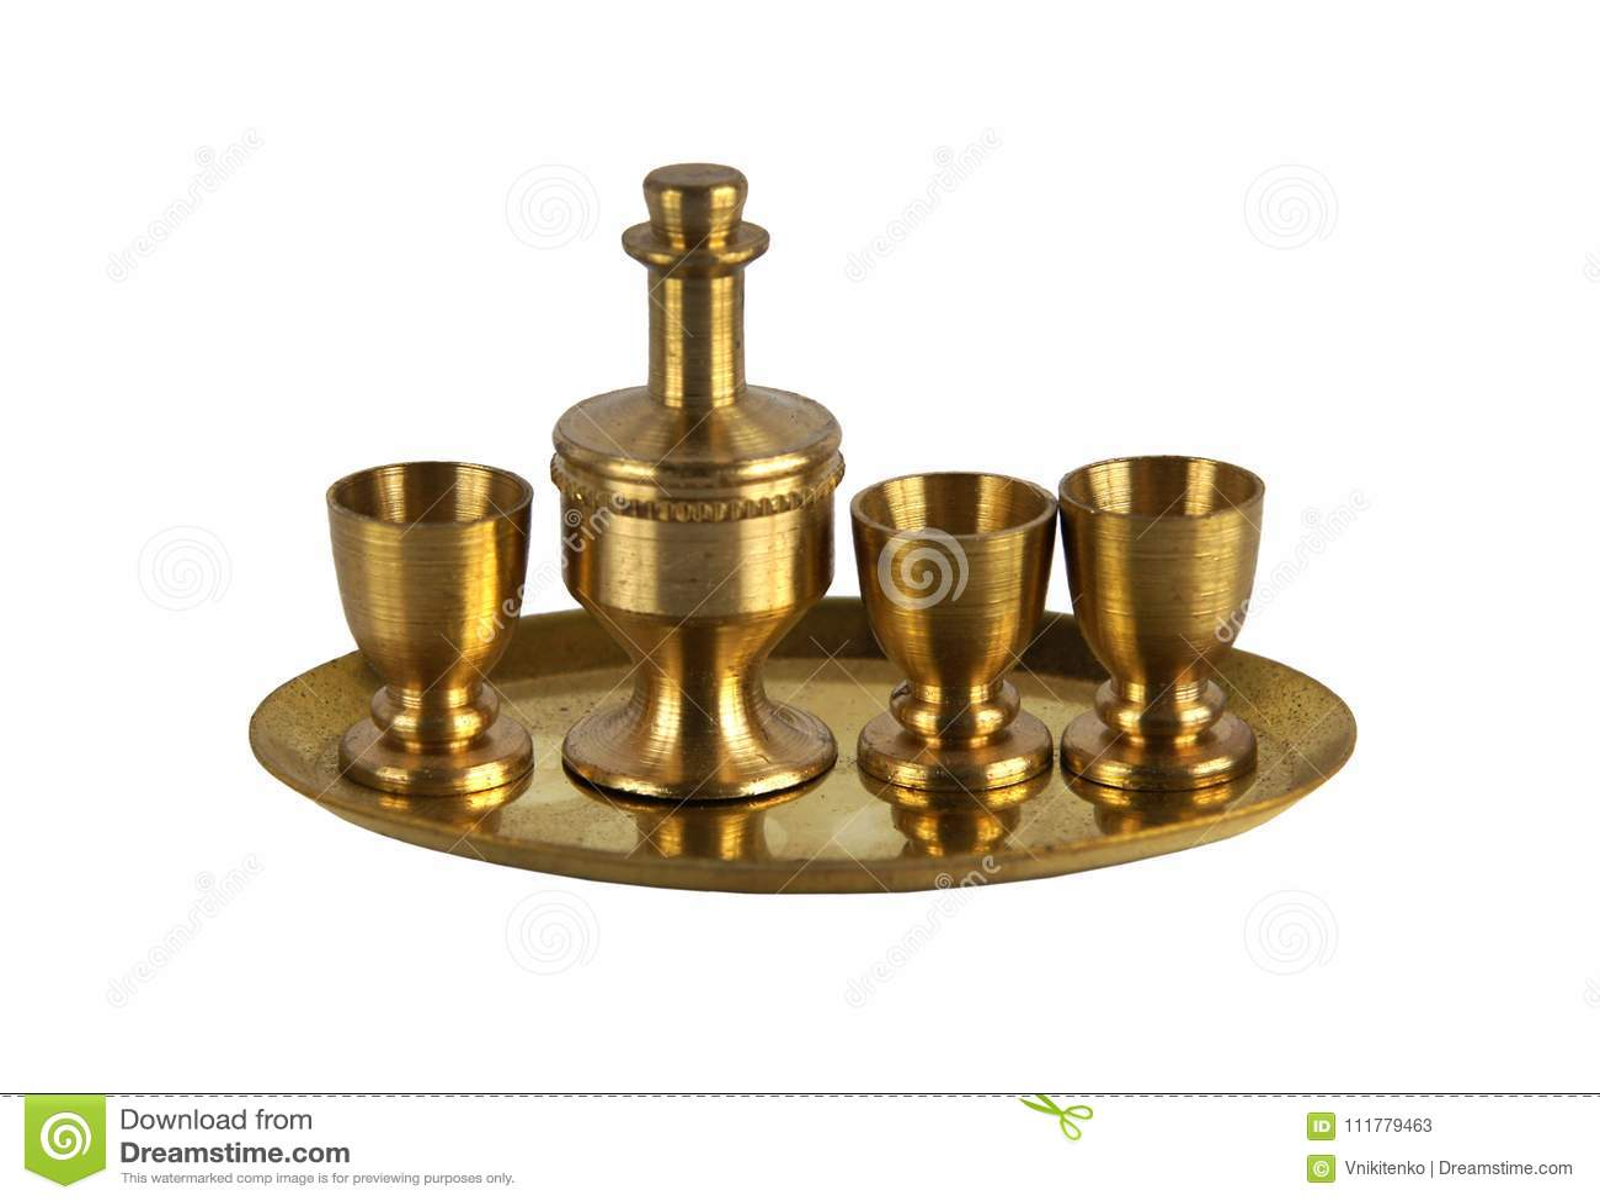 Vintage brass wine service